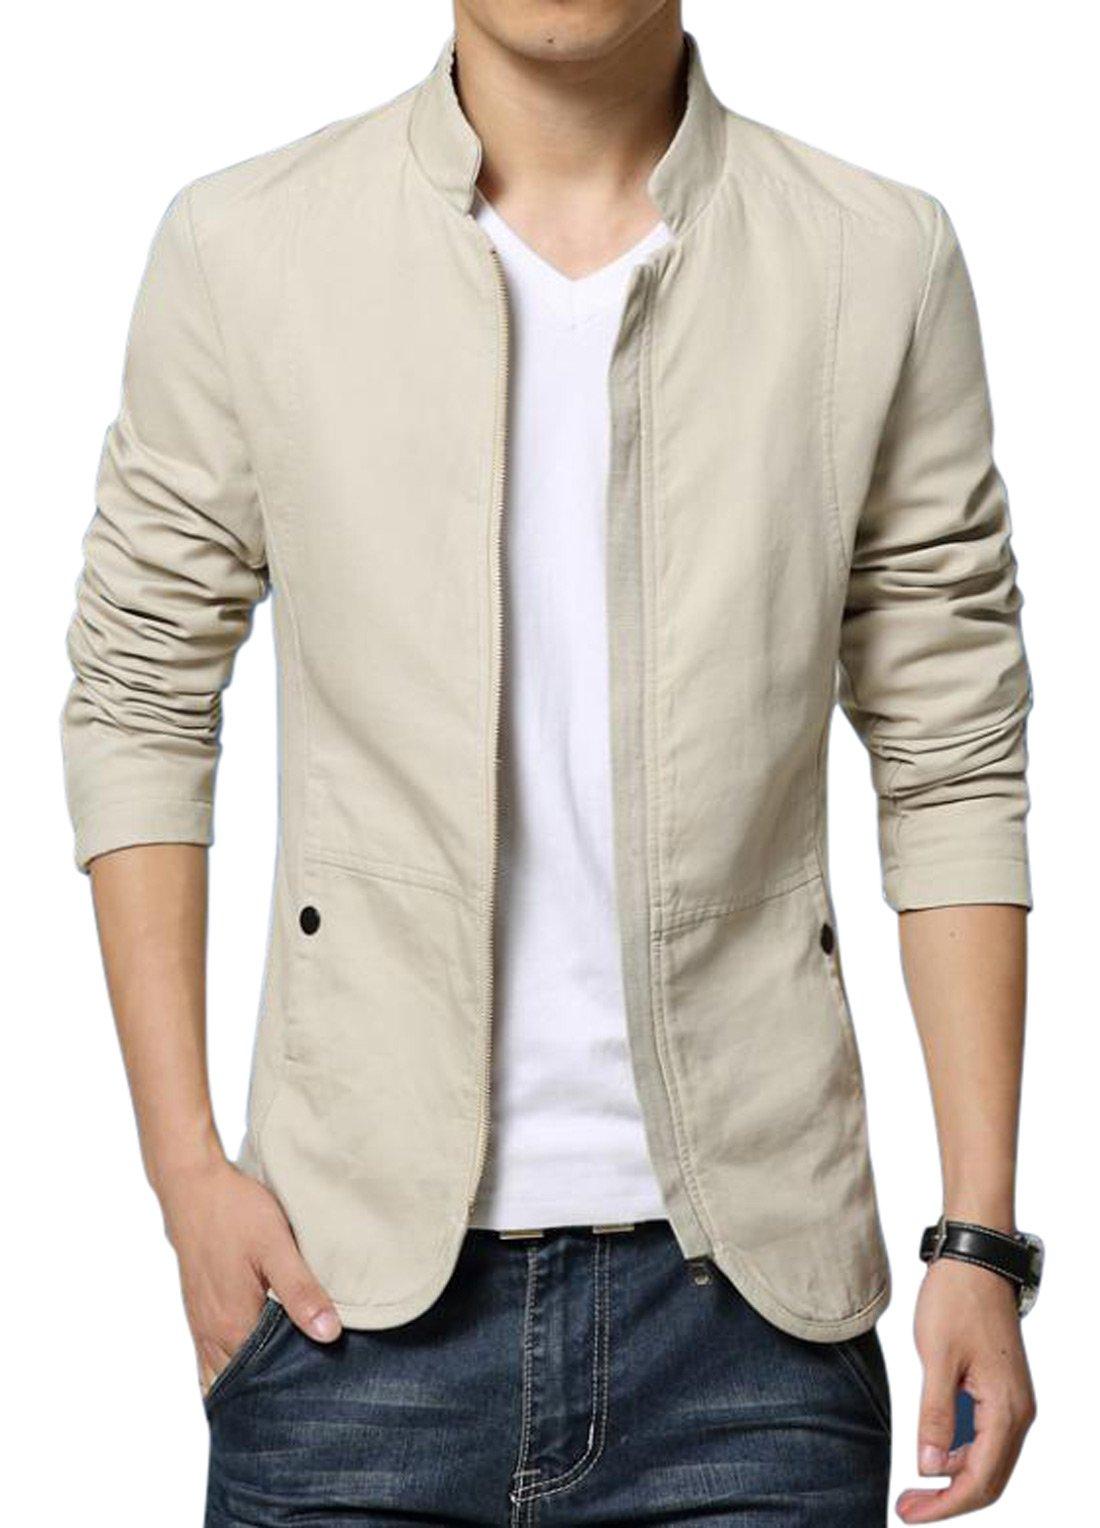 Chouyatou Men's Basic Mandarin Collar Zip Lightweight Fitted Cotton Jacket (Large, Beige)